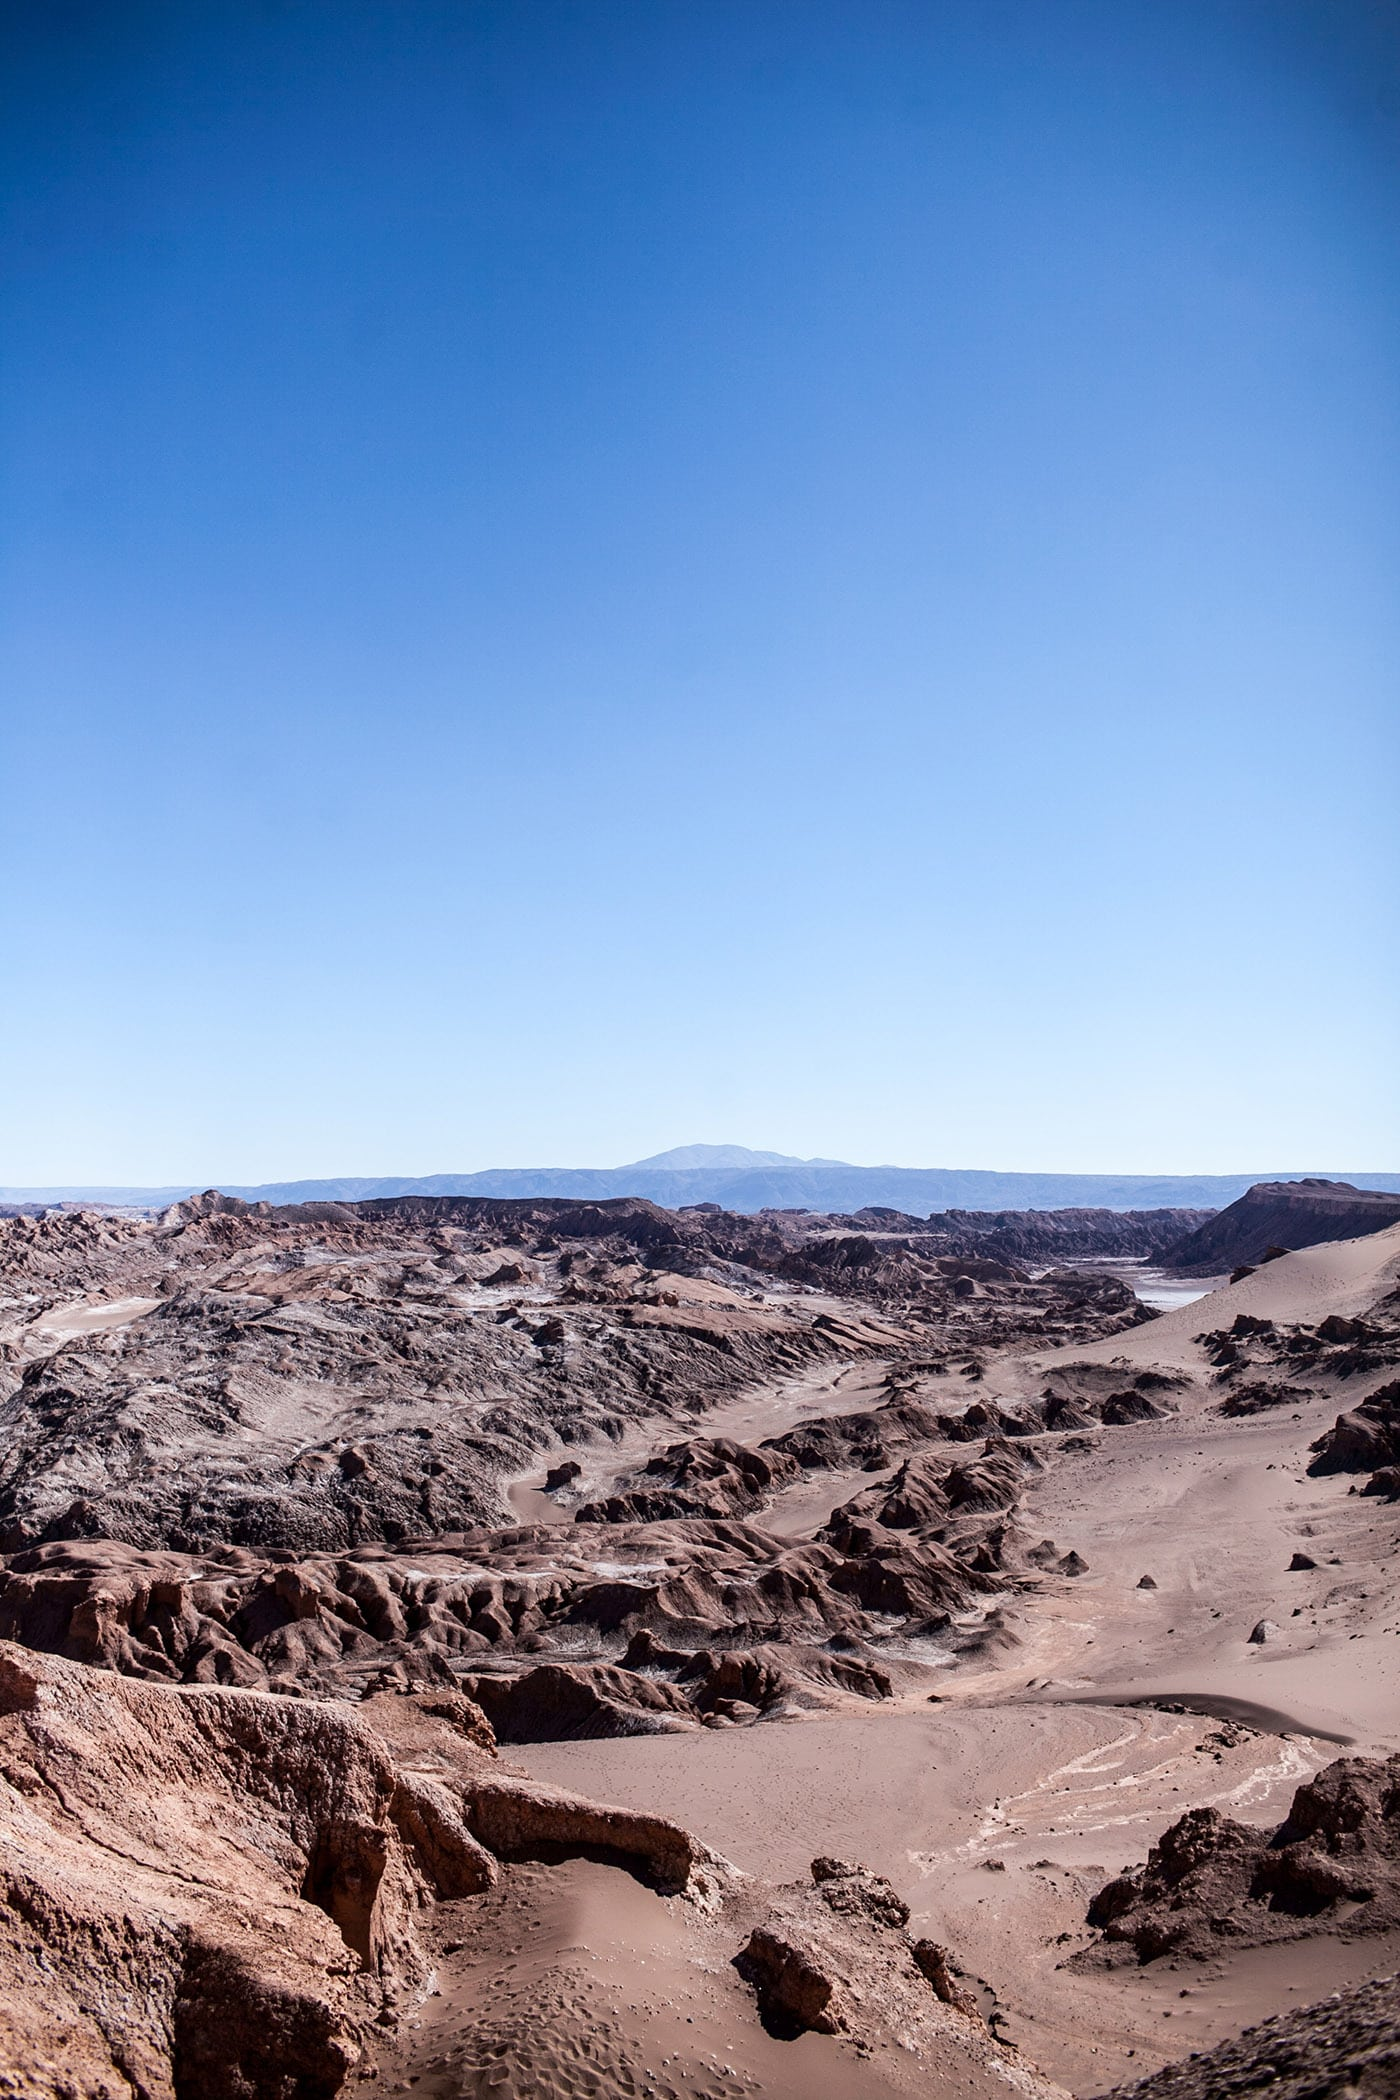 Valle de Luna - Moon Valley - Tour in San Pedro de Atacama, Chile